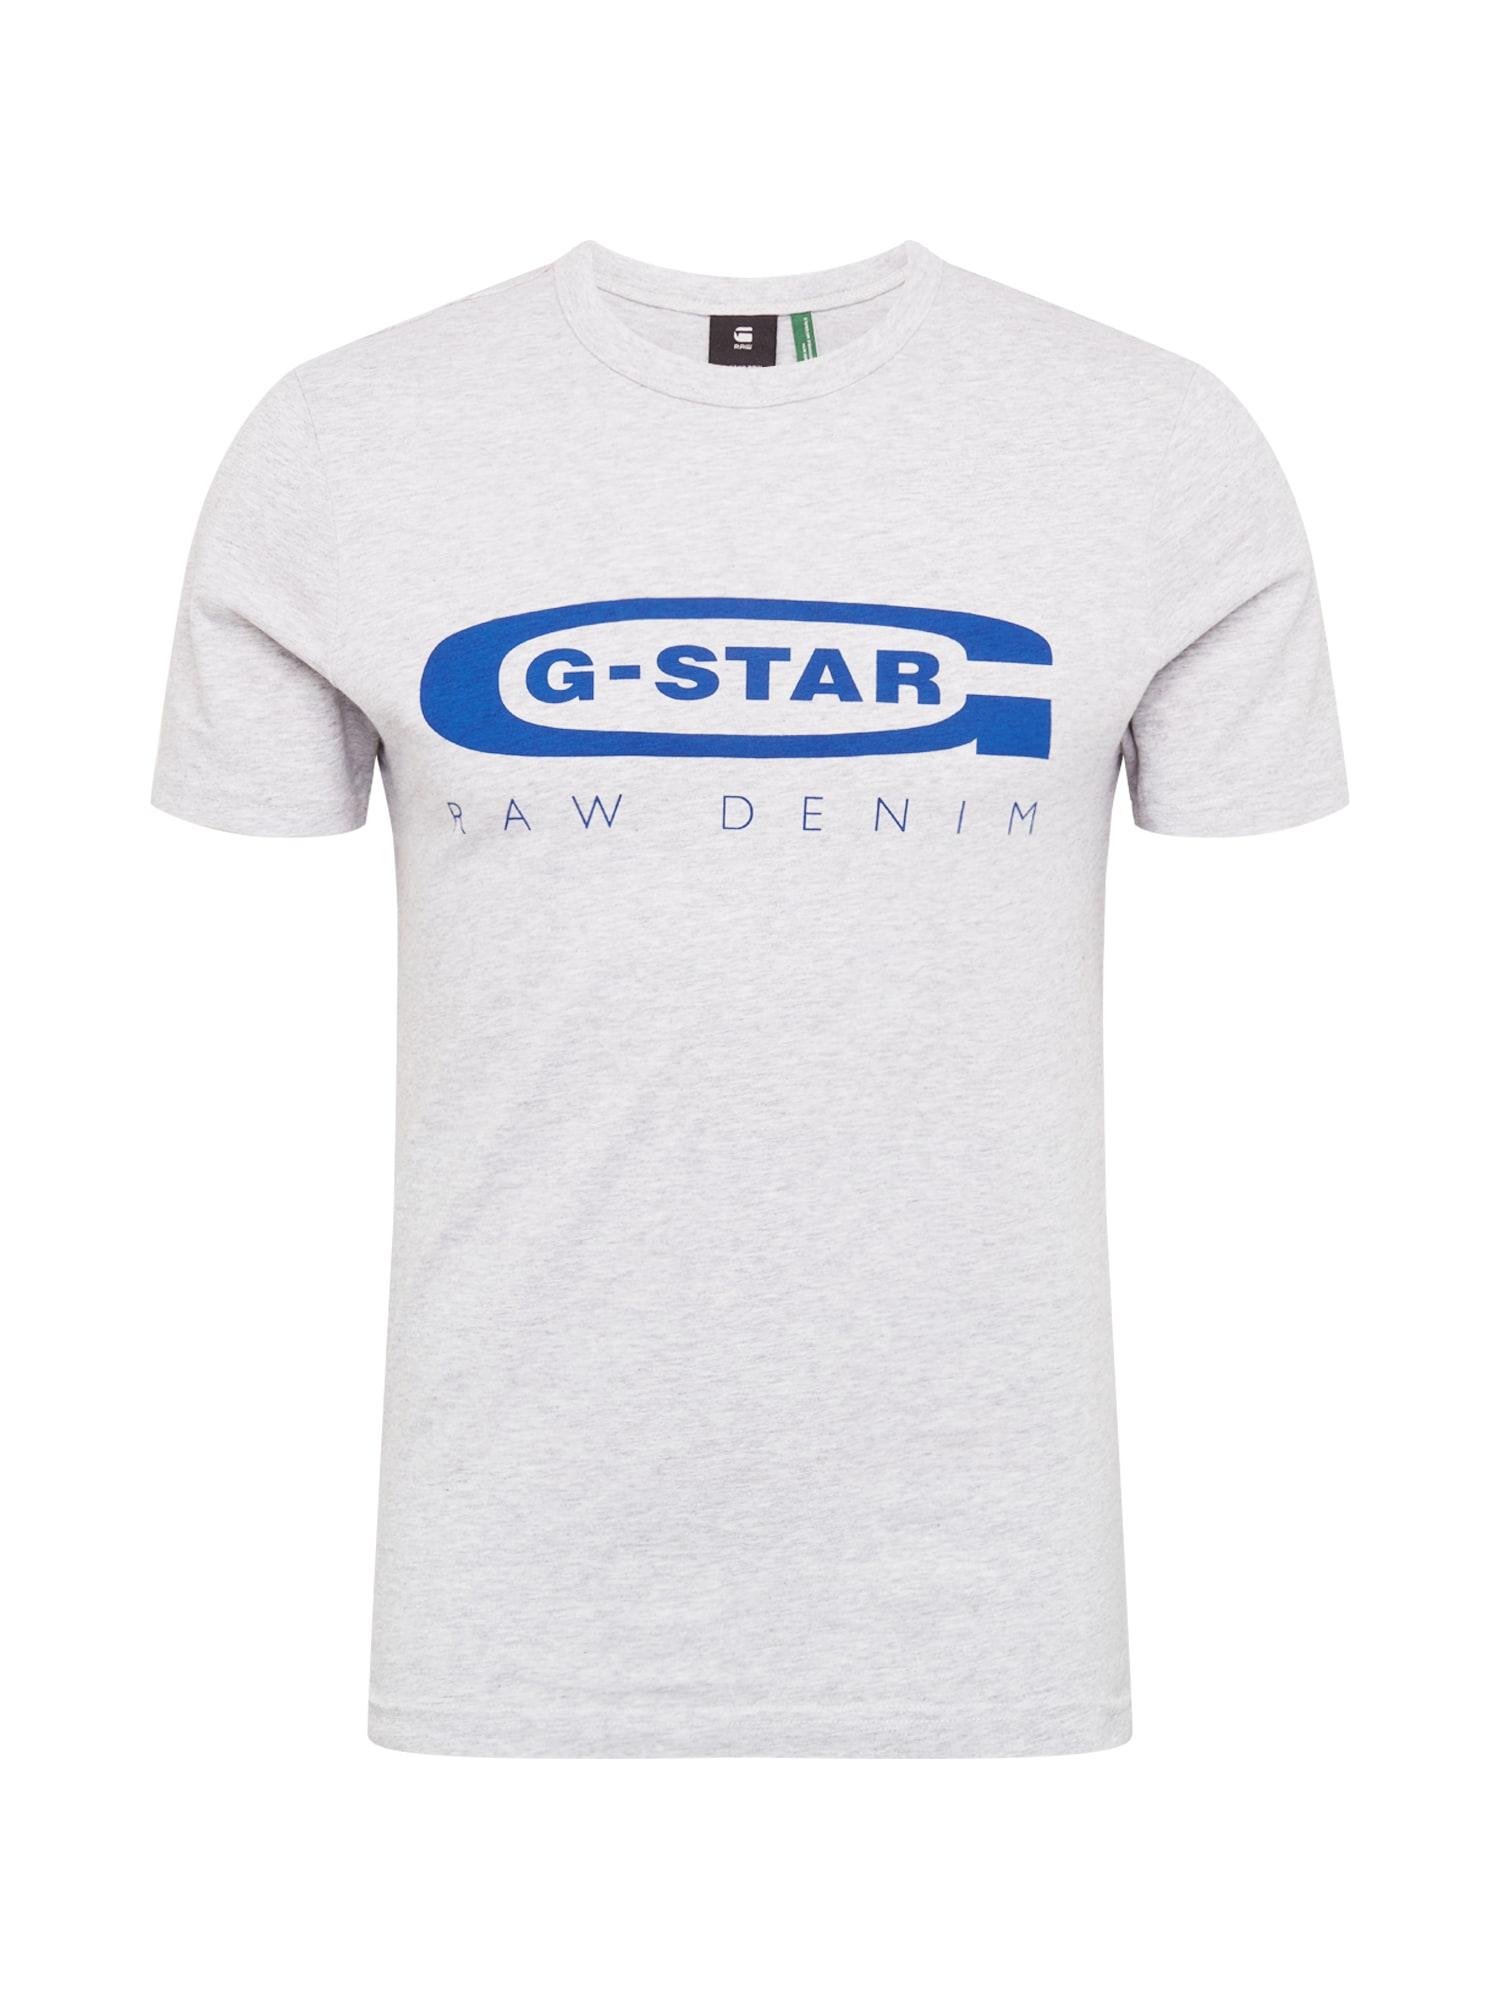 Tričko Graphic 4 modrá světle šedá G-STAR RAW